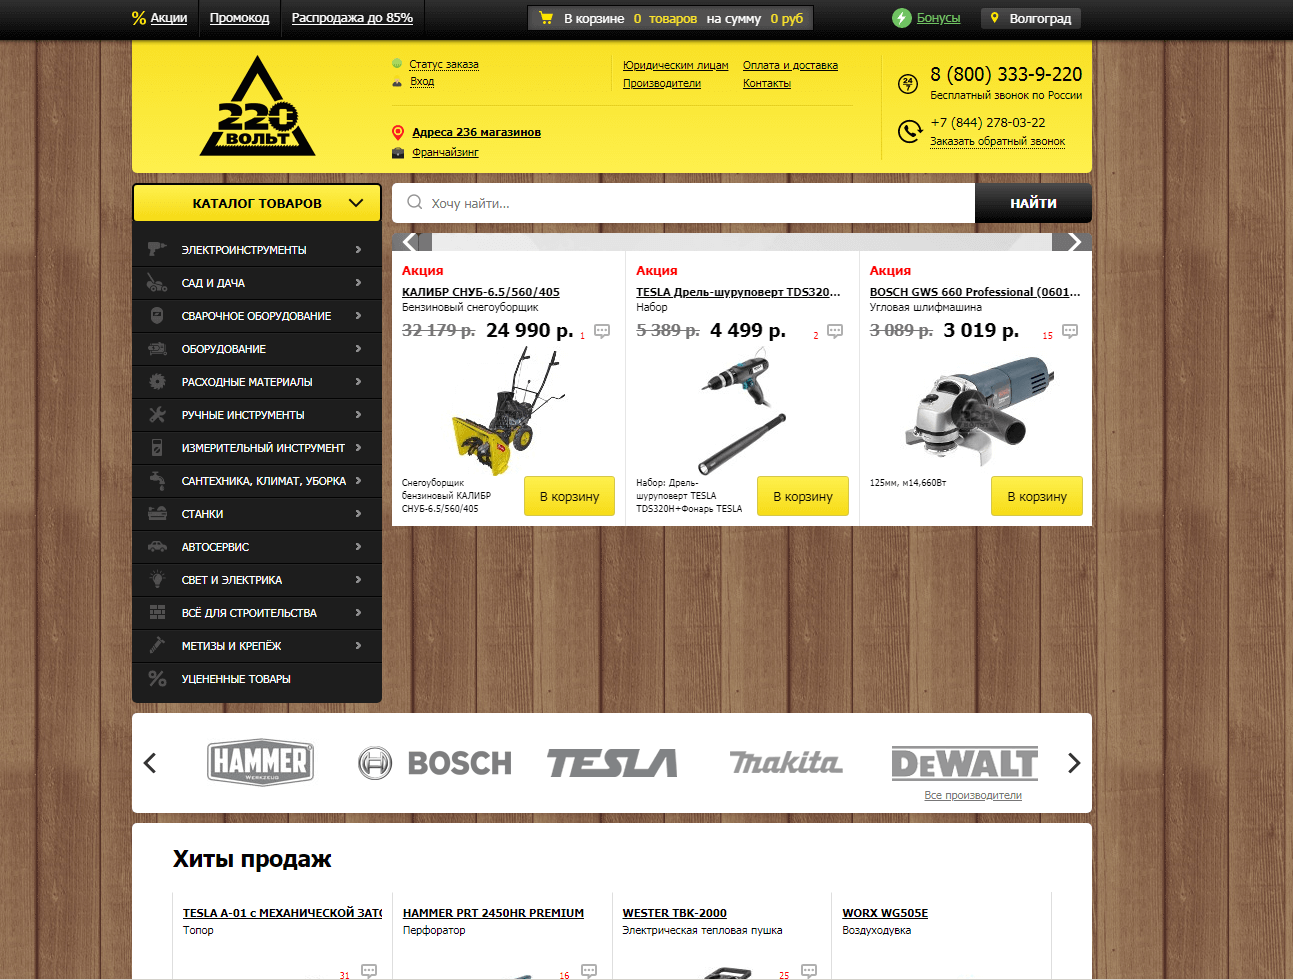 220-volt.ru website